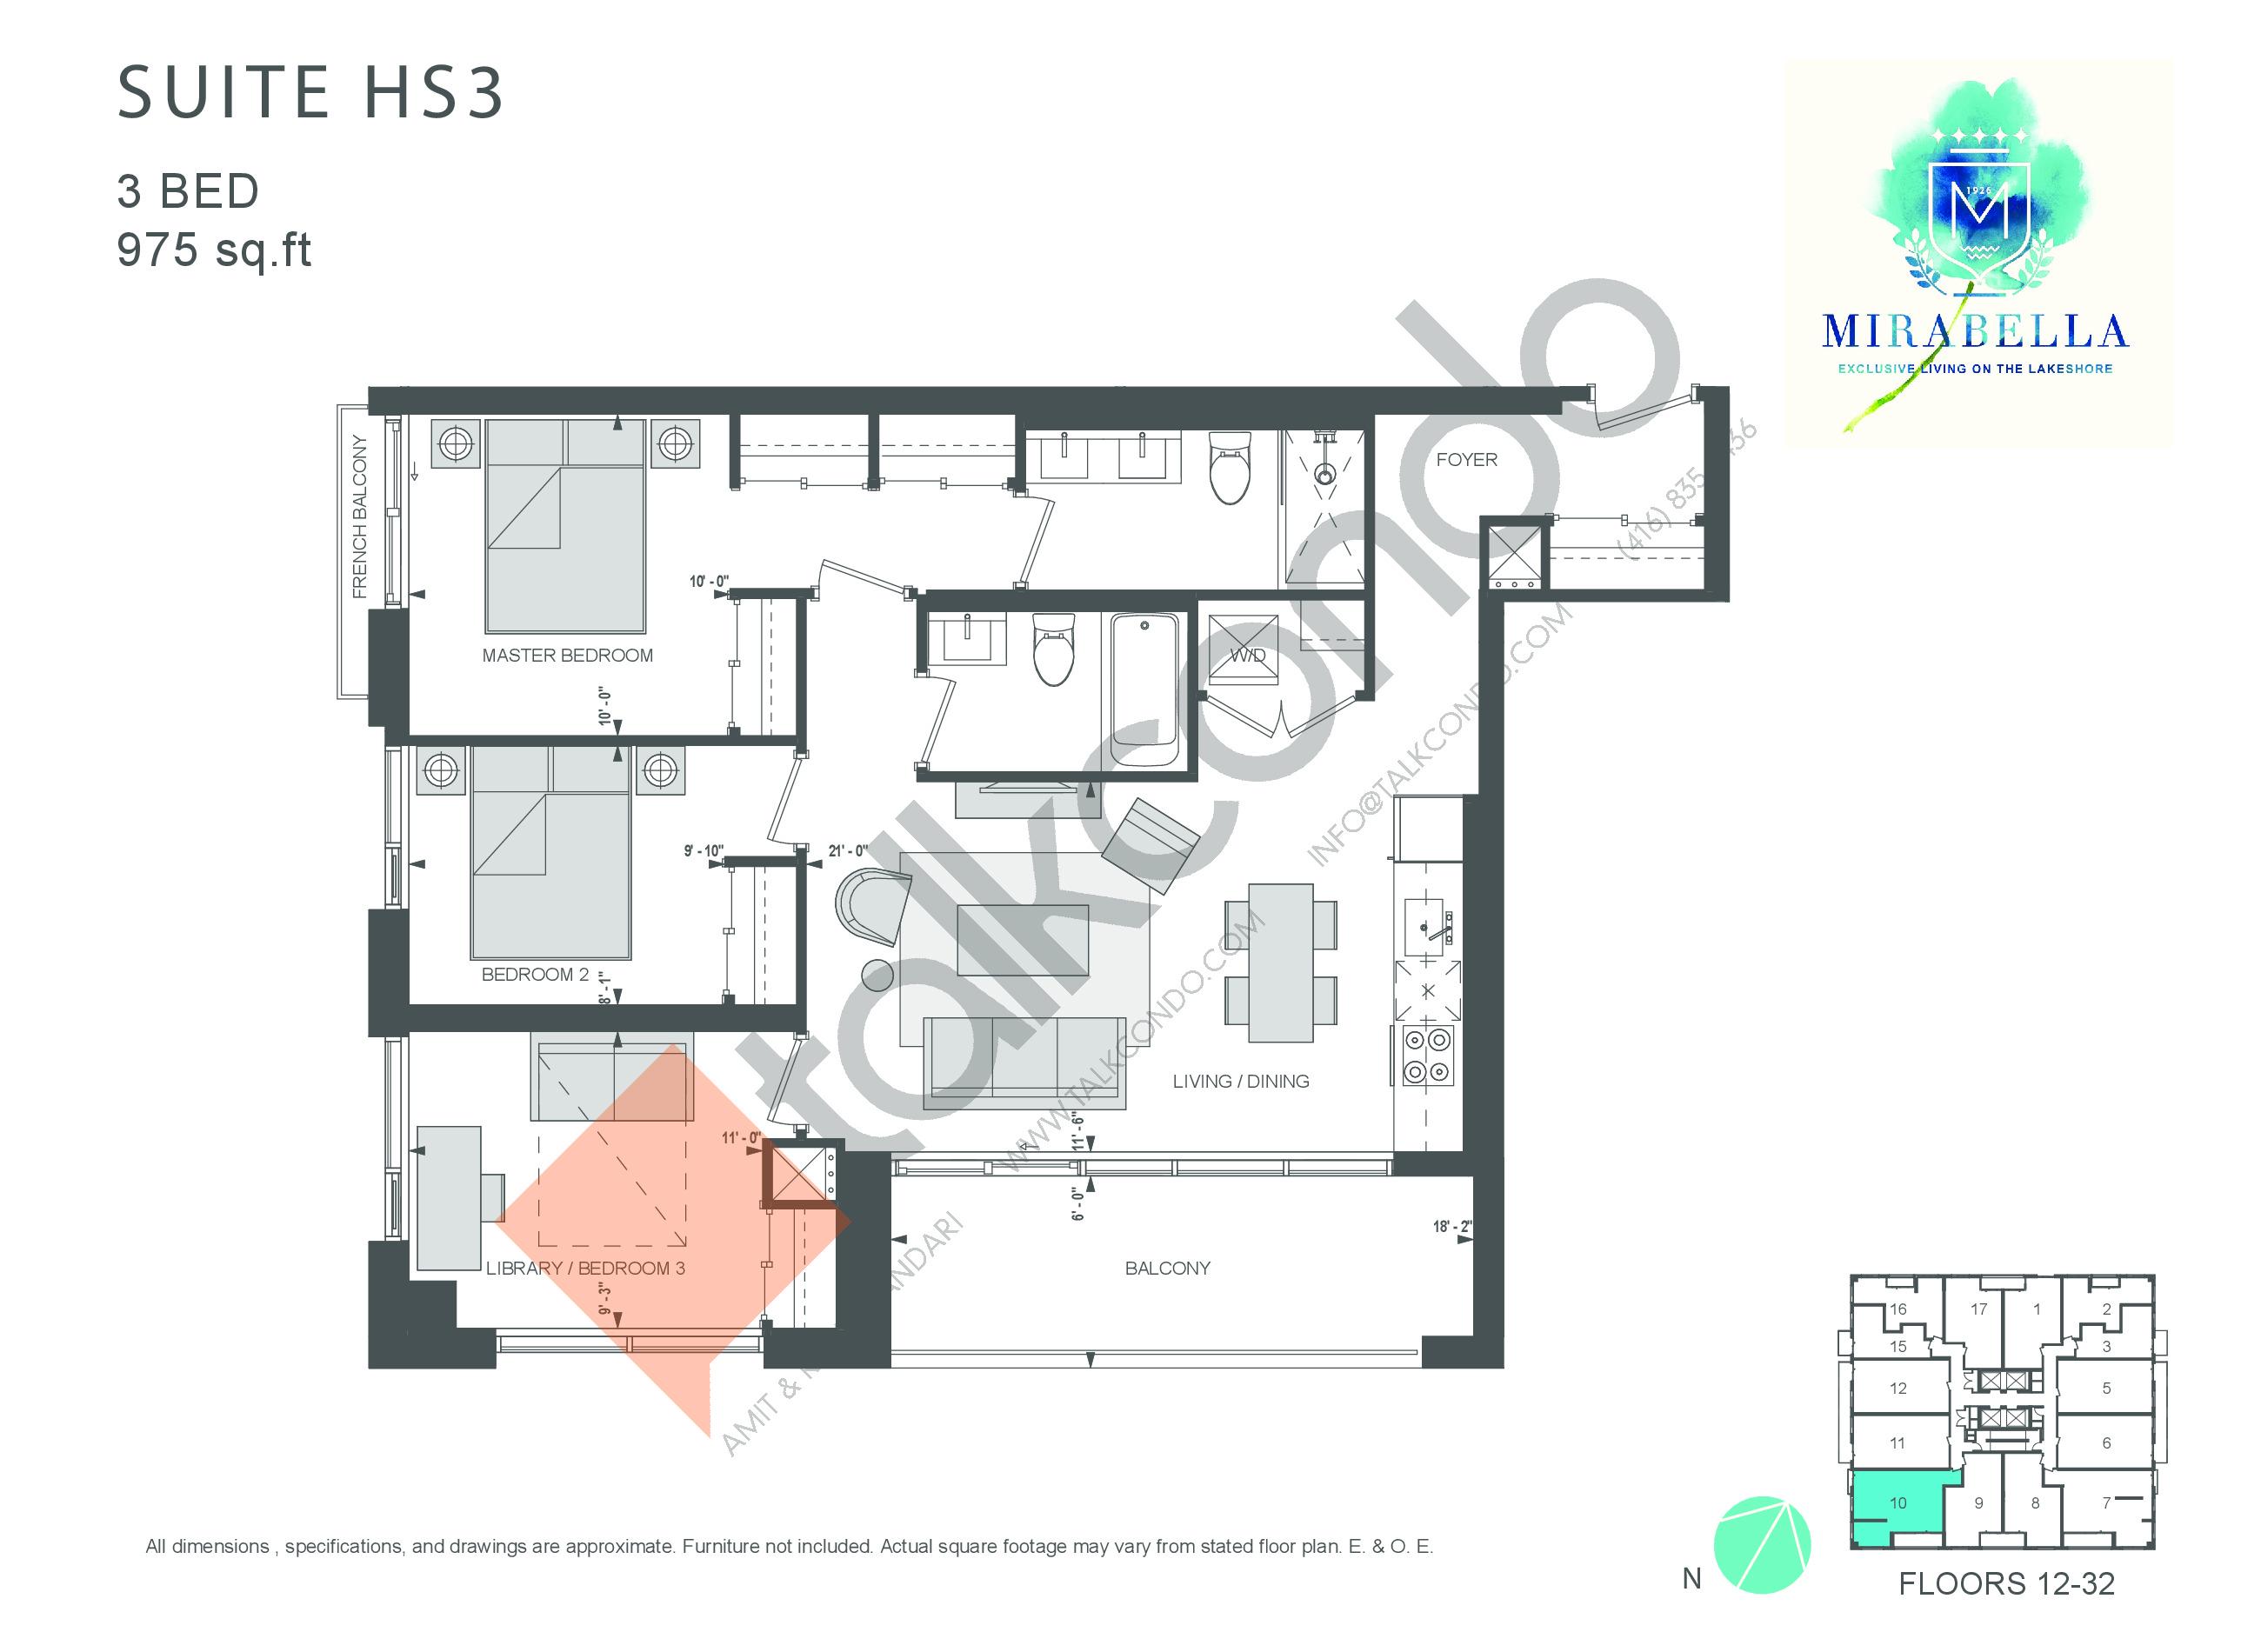 Suite HS3 Floor Plan at Mirabella Luxury Condos East Tower - 975 sq.ft